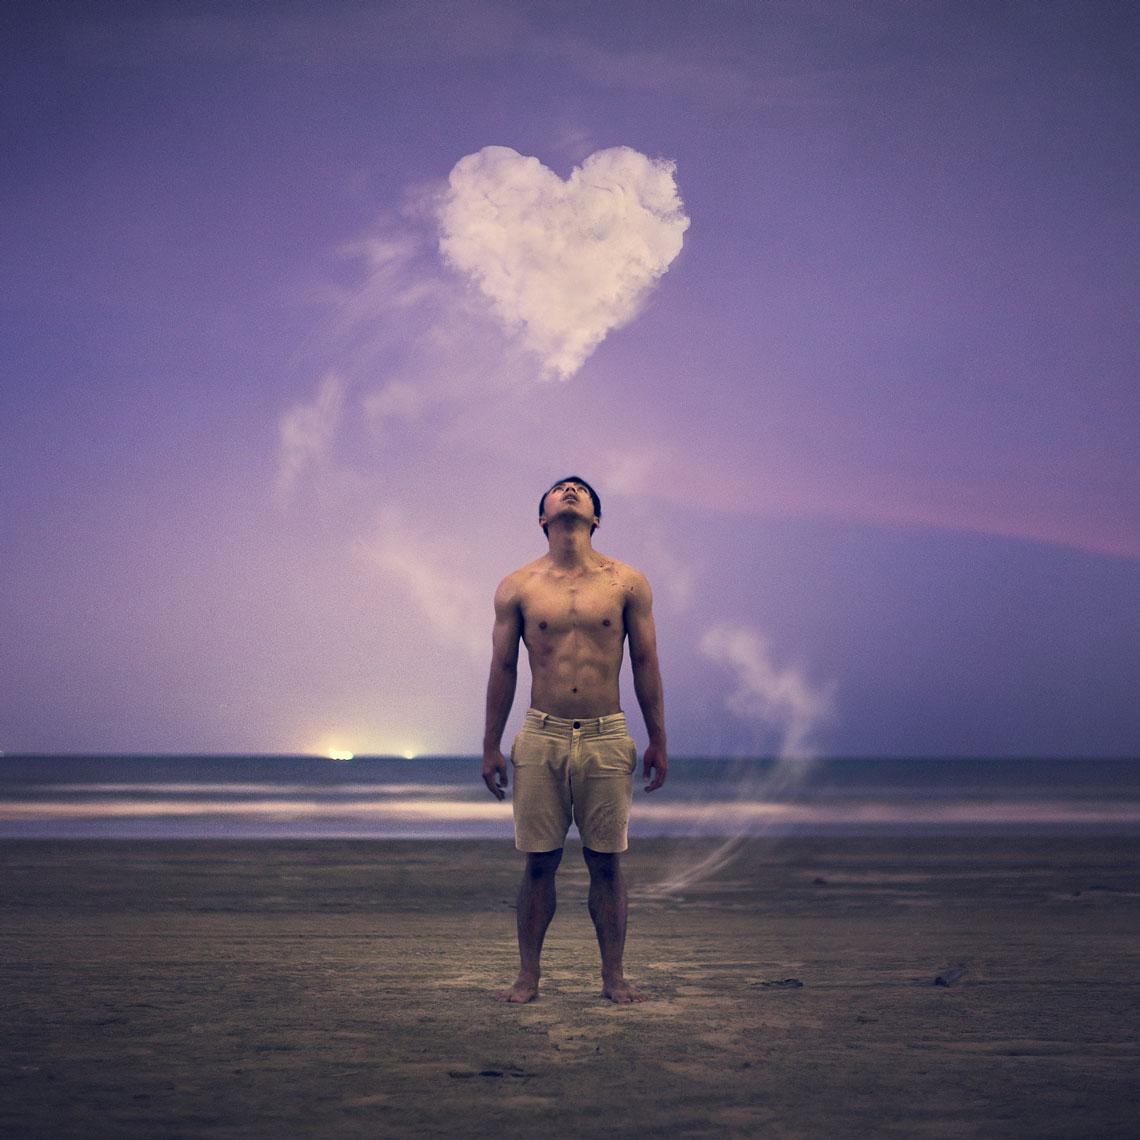 heart-cloud-overhead